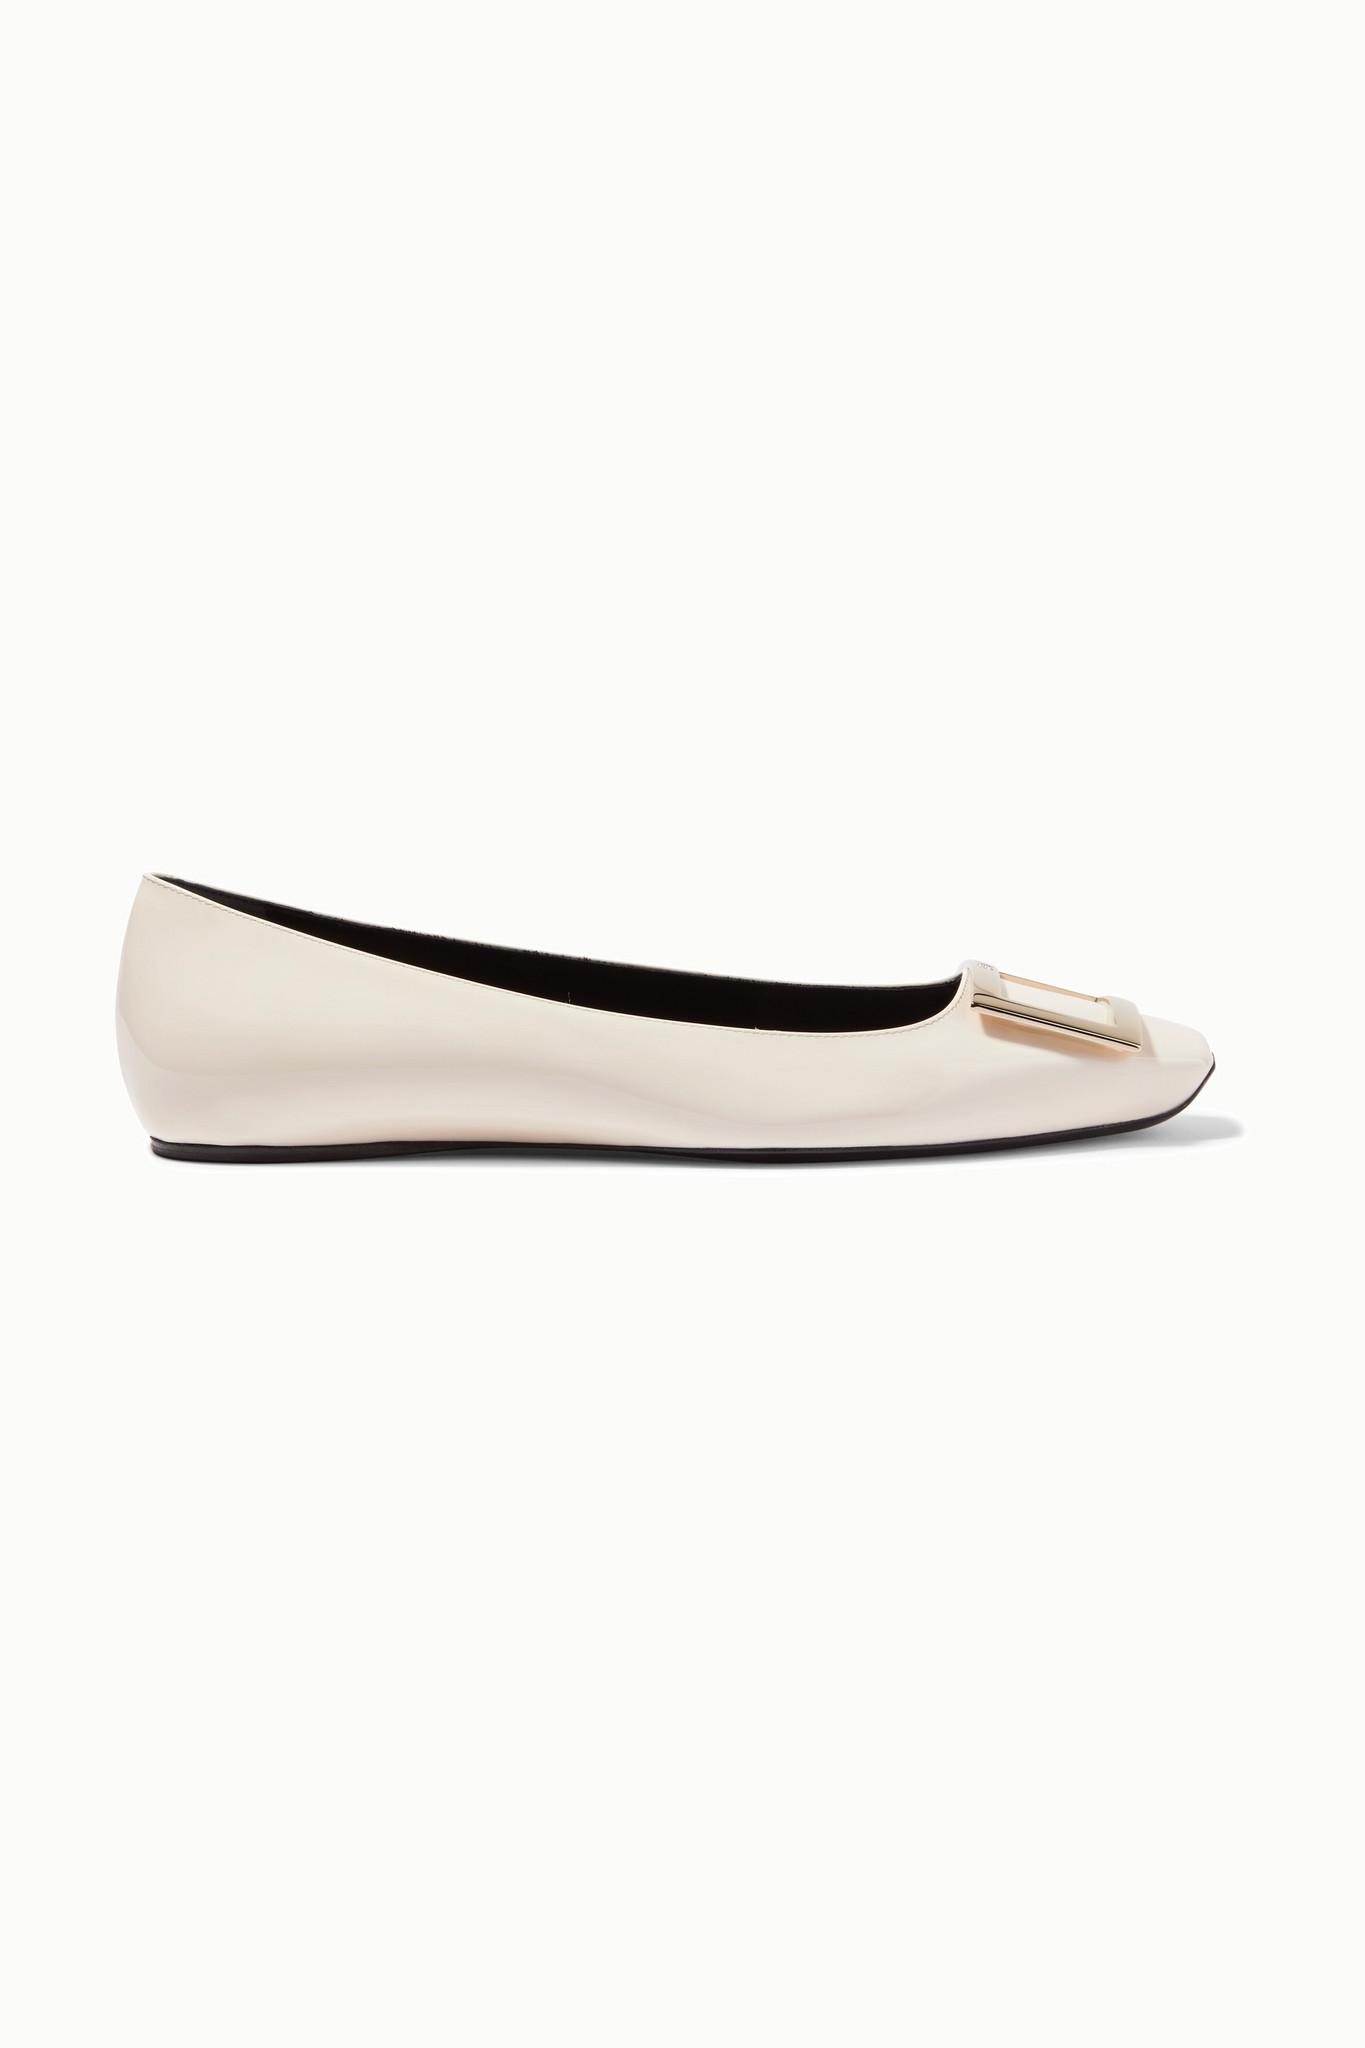 ROGER VIVIER - Trompette Bellerine Patent-leather Ballet Flats - White - IT34